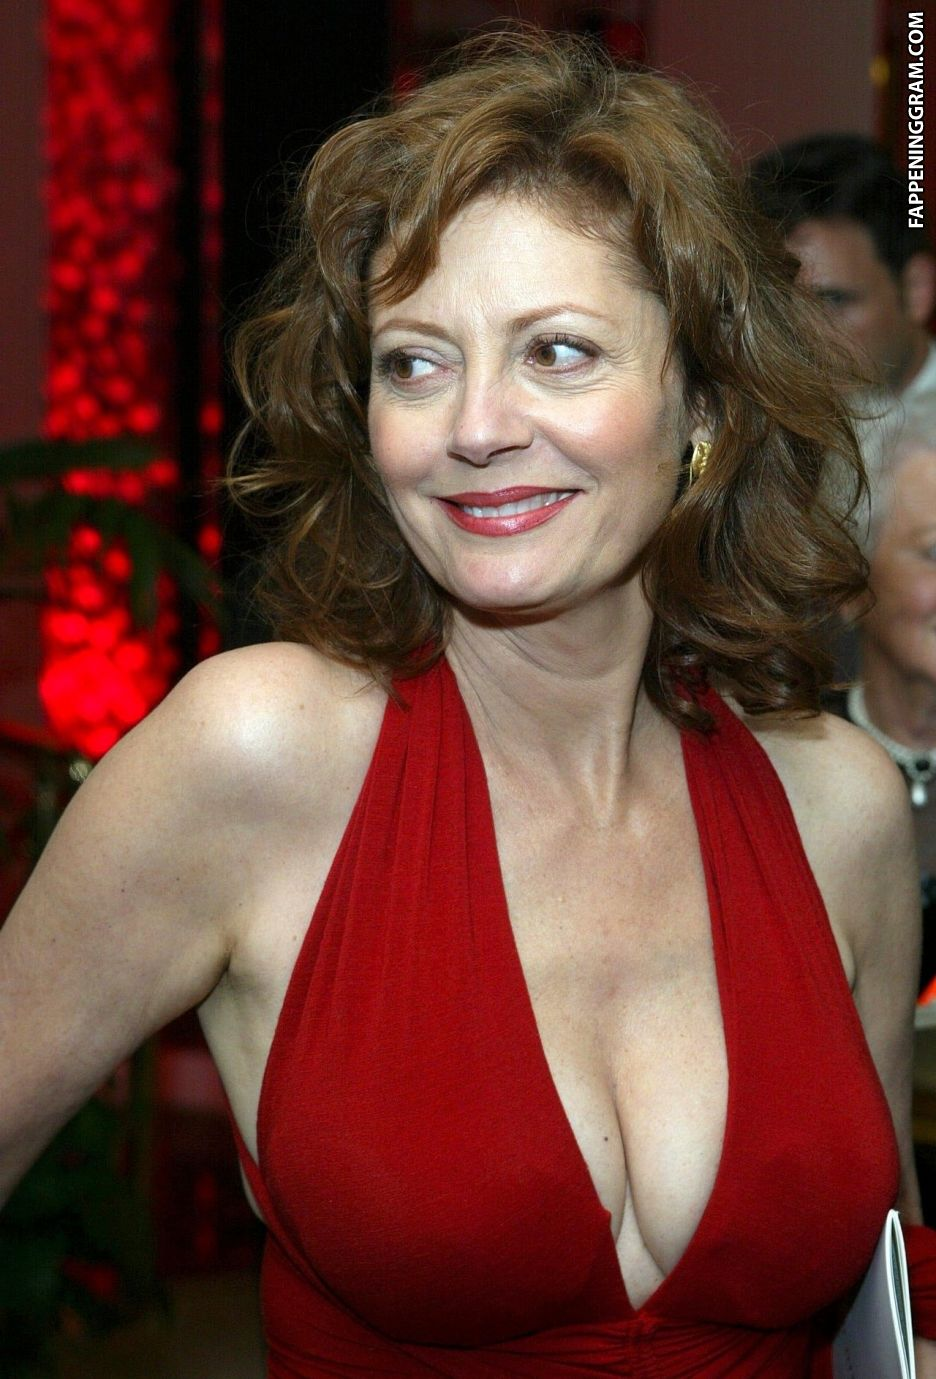 Susan Sarandon Nude The Fappening - FappeningGram